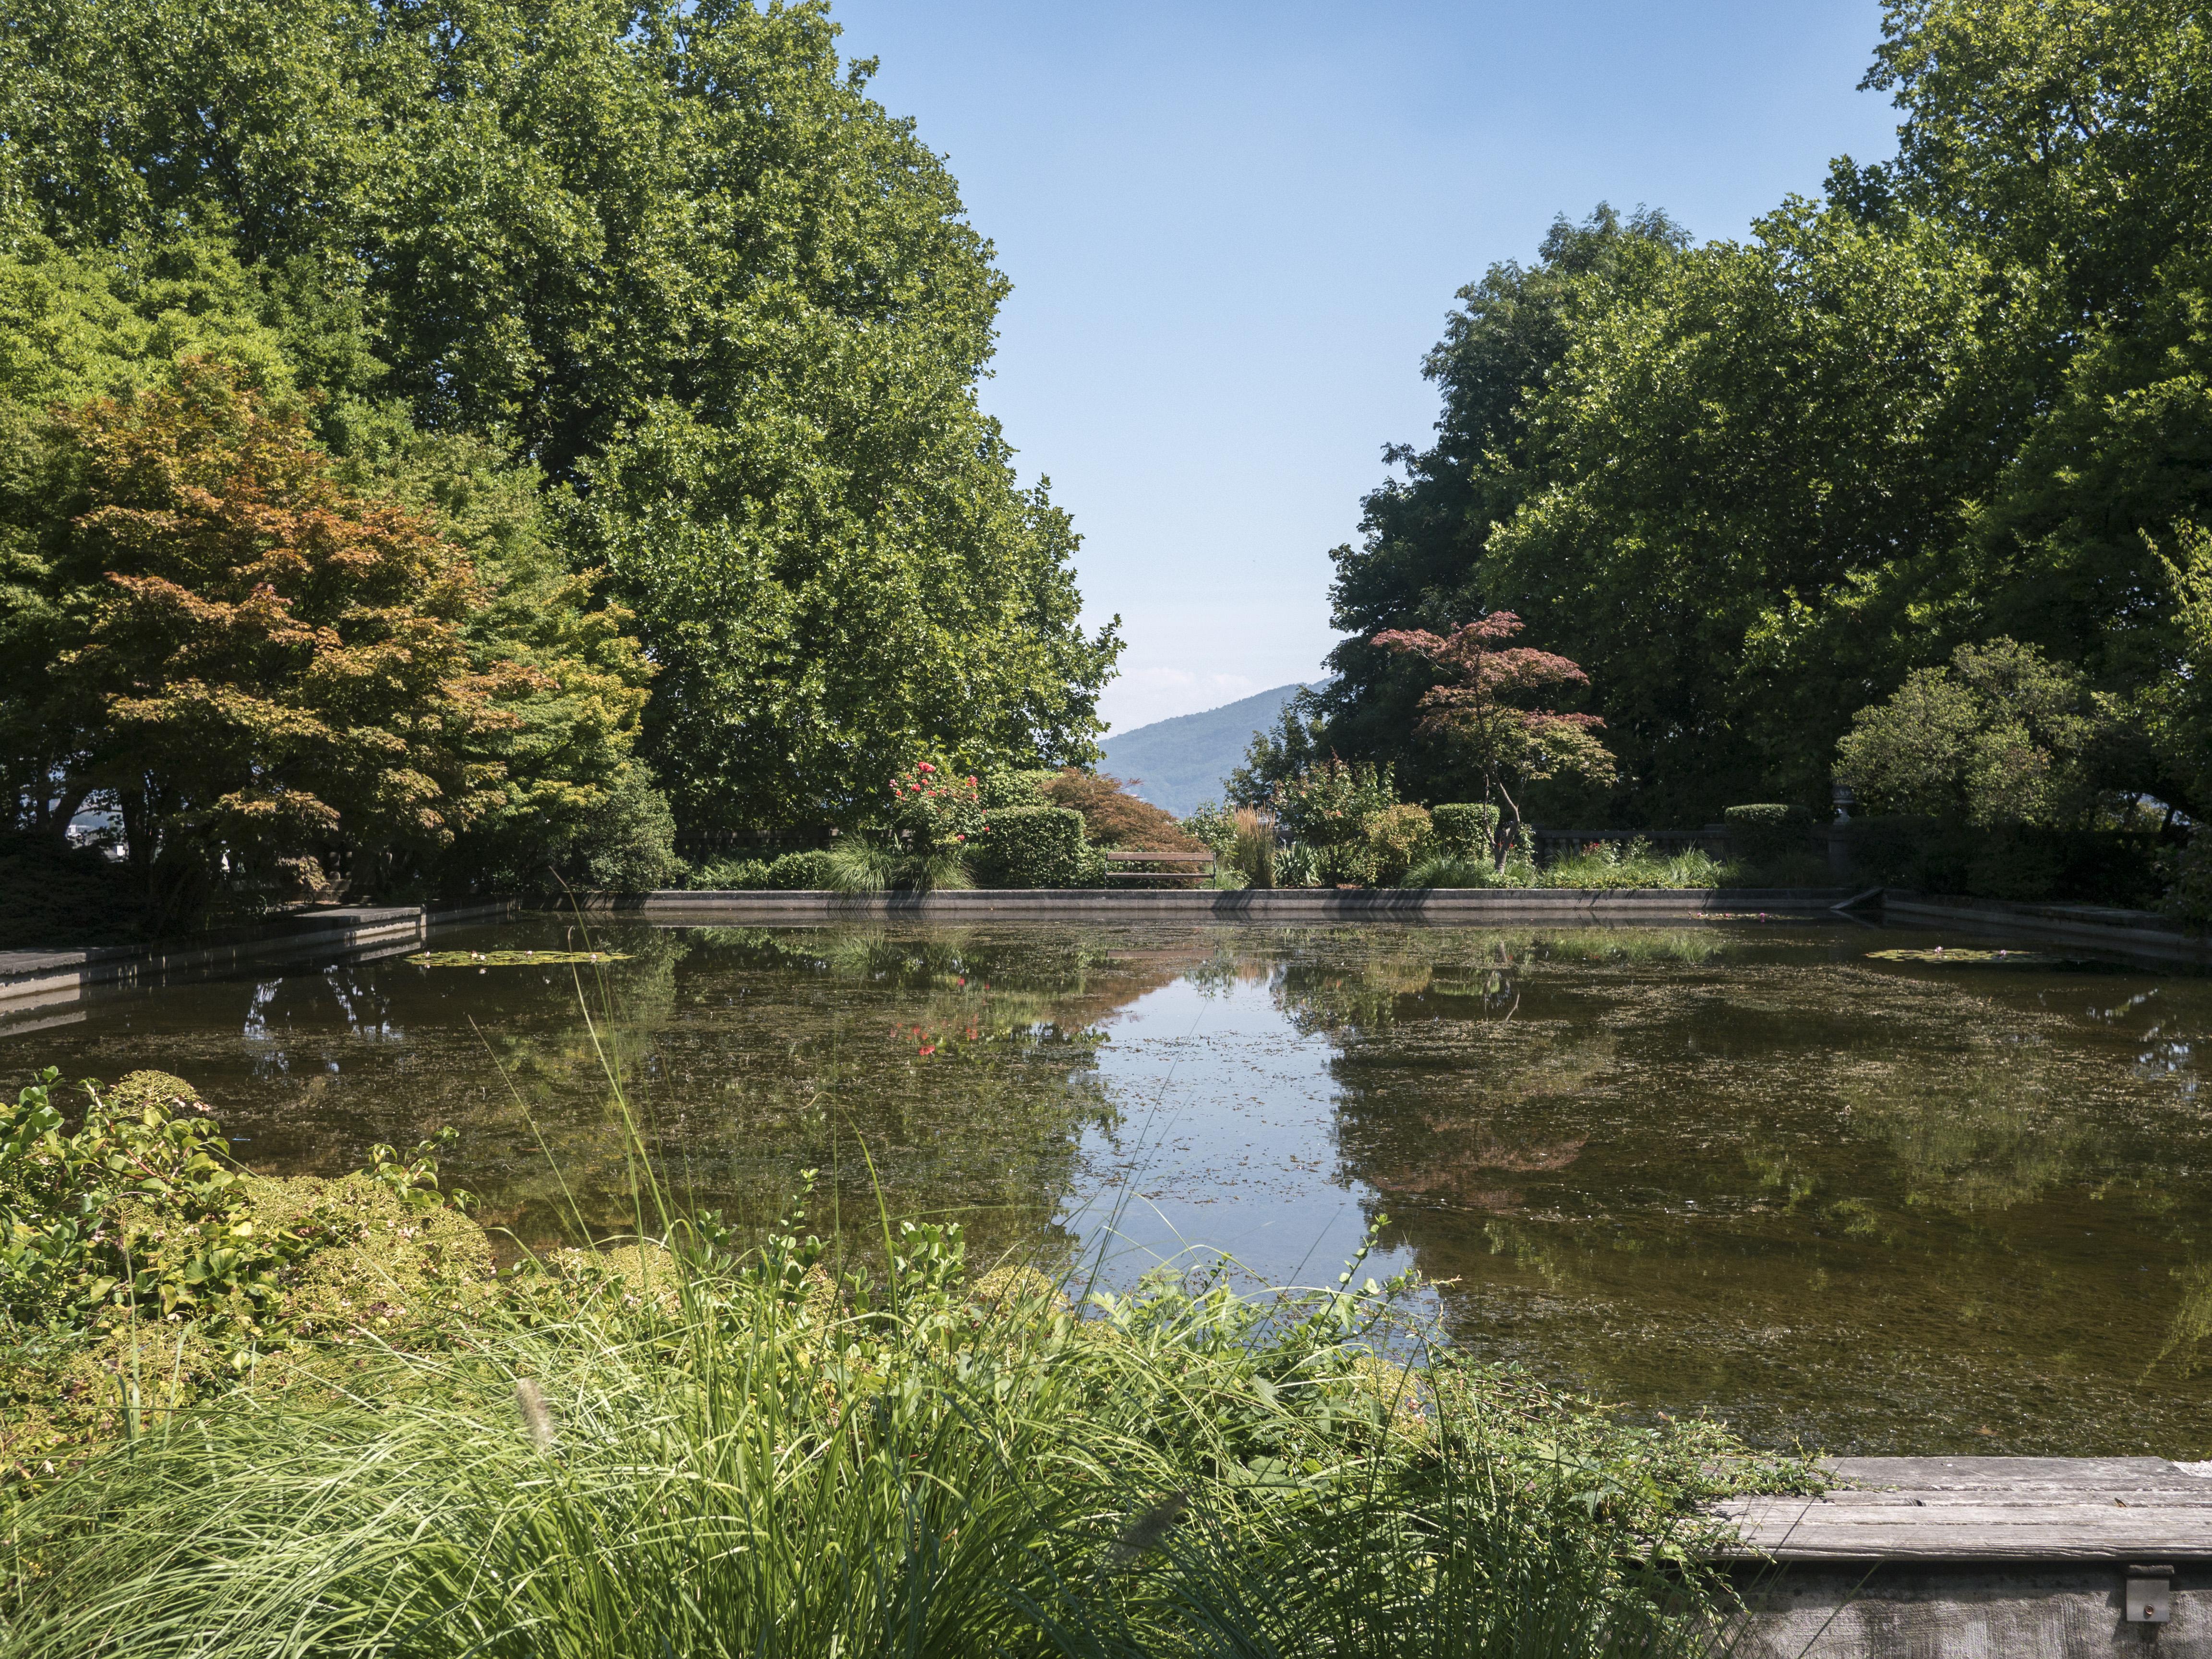 Gartenbau Linz file linz hatschekvilla gartenbaudenkmal 9 jpg wikimedia commons